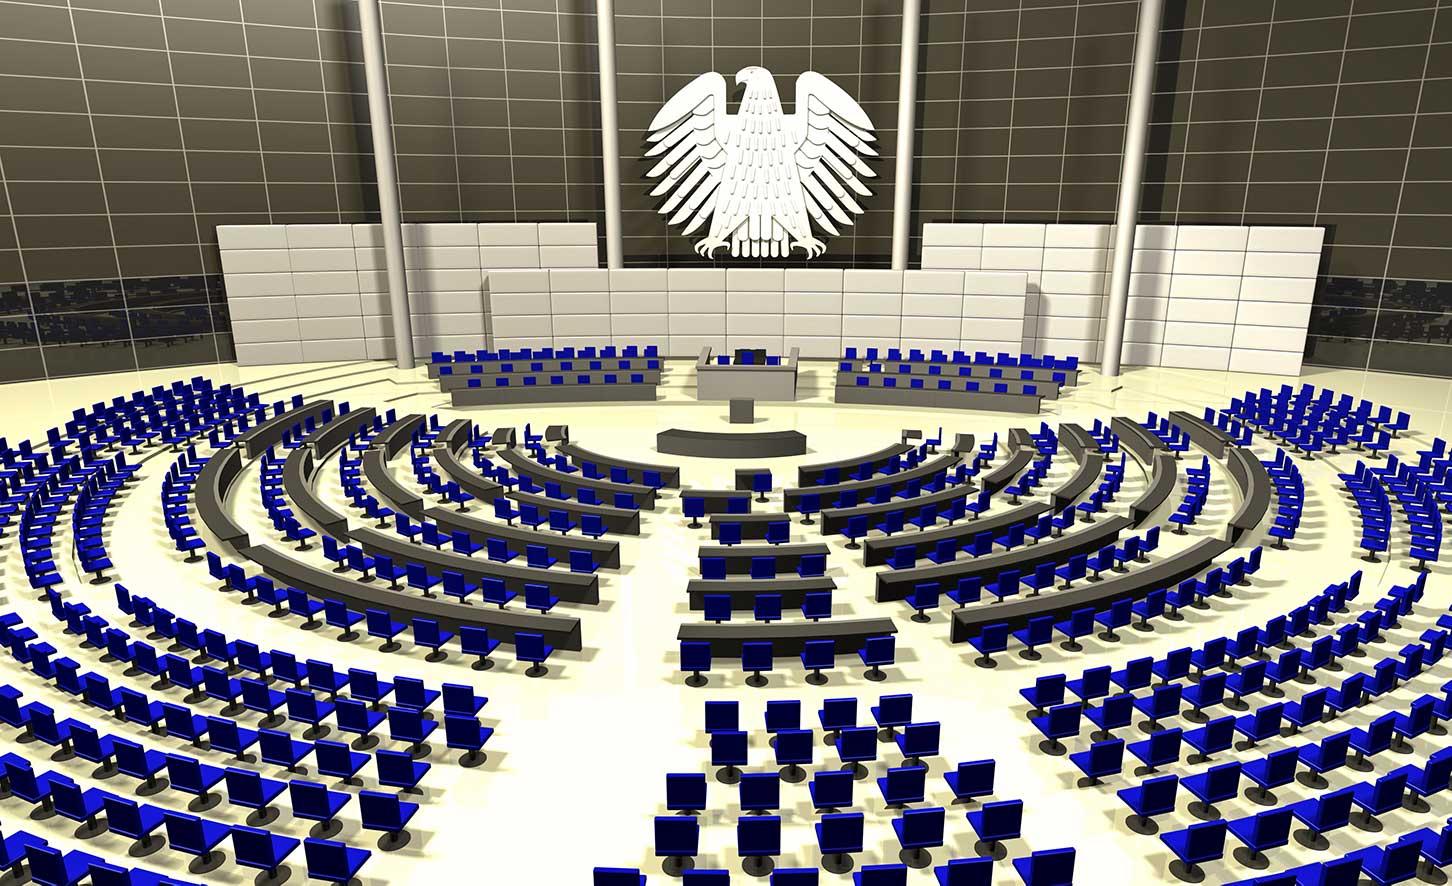 Frontalansicht des Bundestags